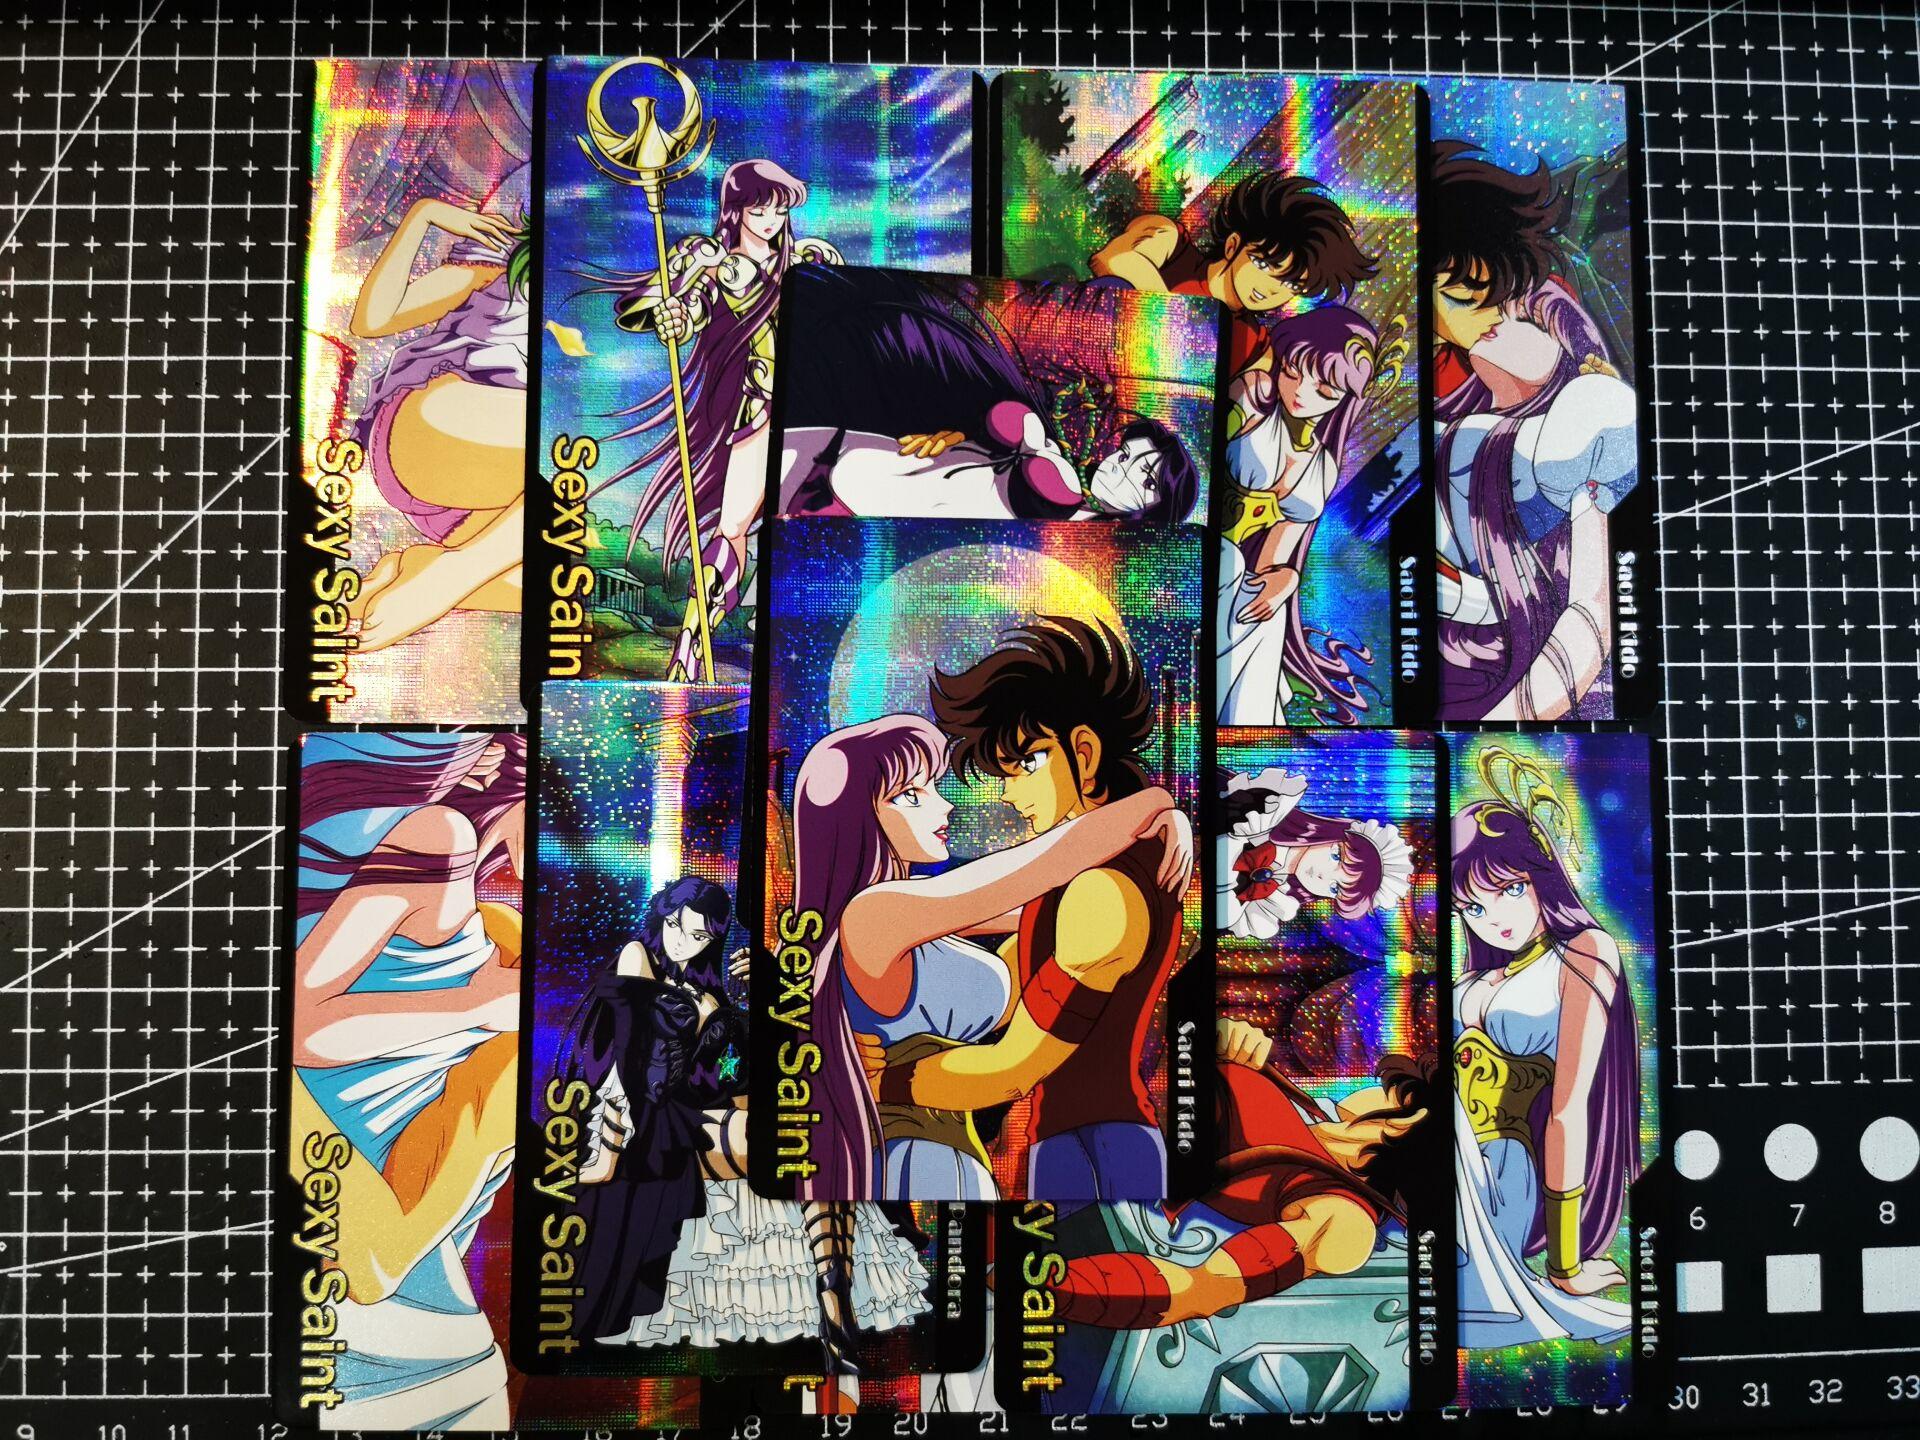 12pcs/set Saint Seiya Fun 2nd Toys Hobbies Hobby Collectibles Game Collection Anime Cards